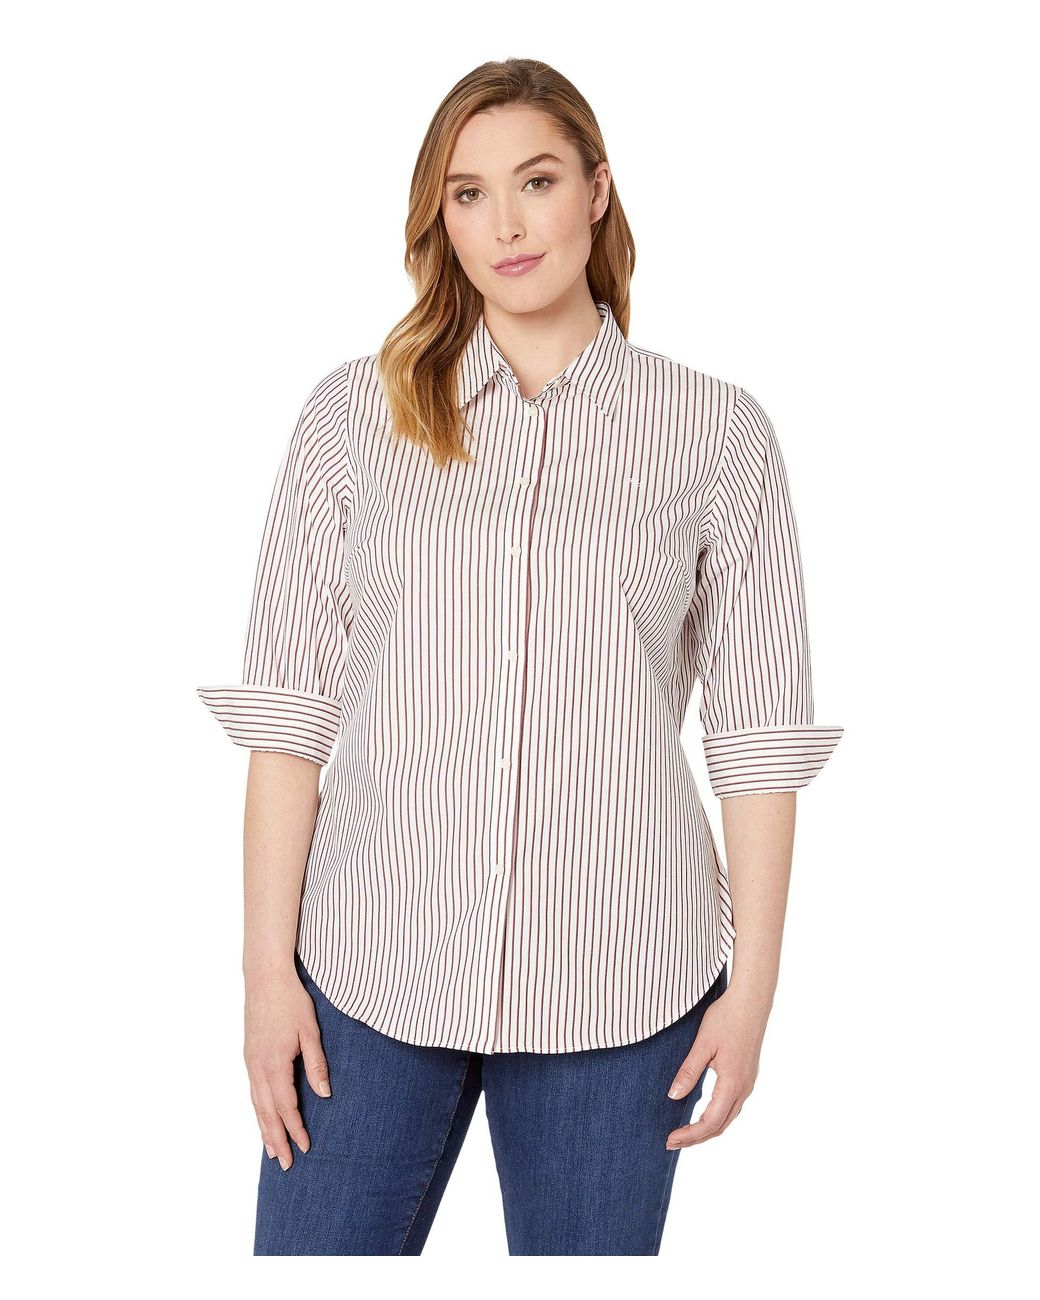 e662d67eb Lauren by Ralph Lauren Plus Size No-iron Striped Button Down Shirt  (white/lipstick Red Multi) Women's T Shirt in White - Lyst